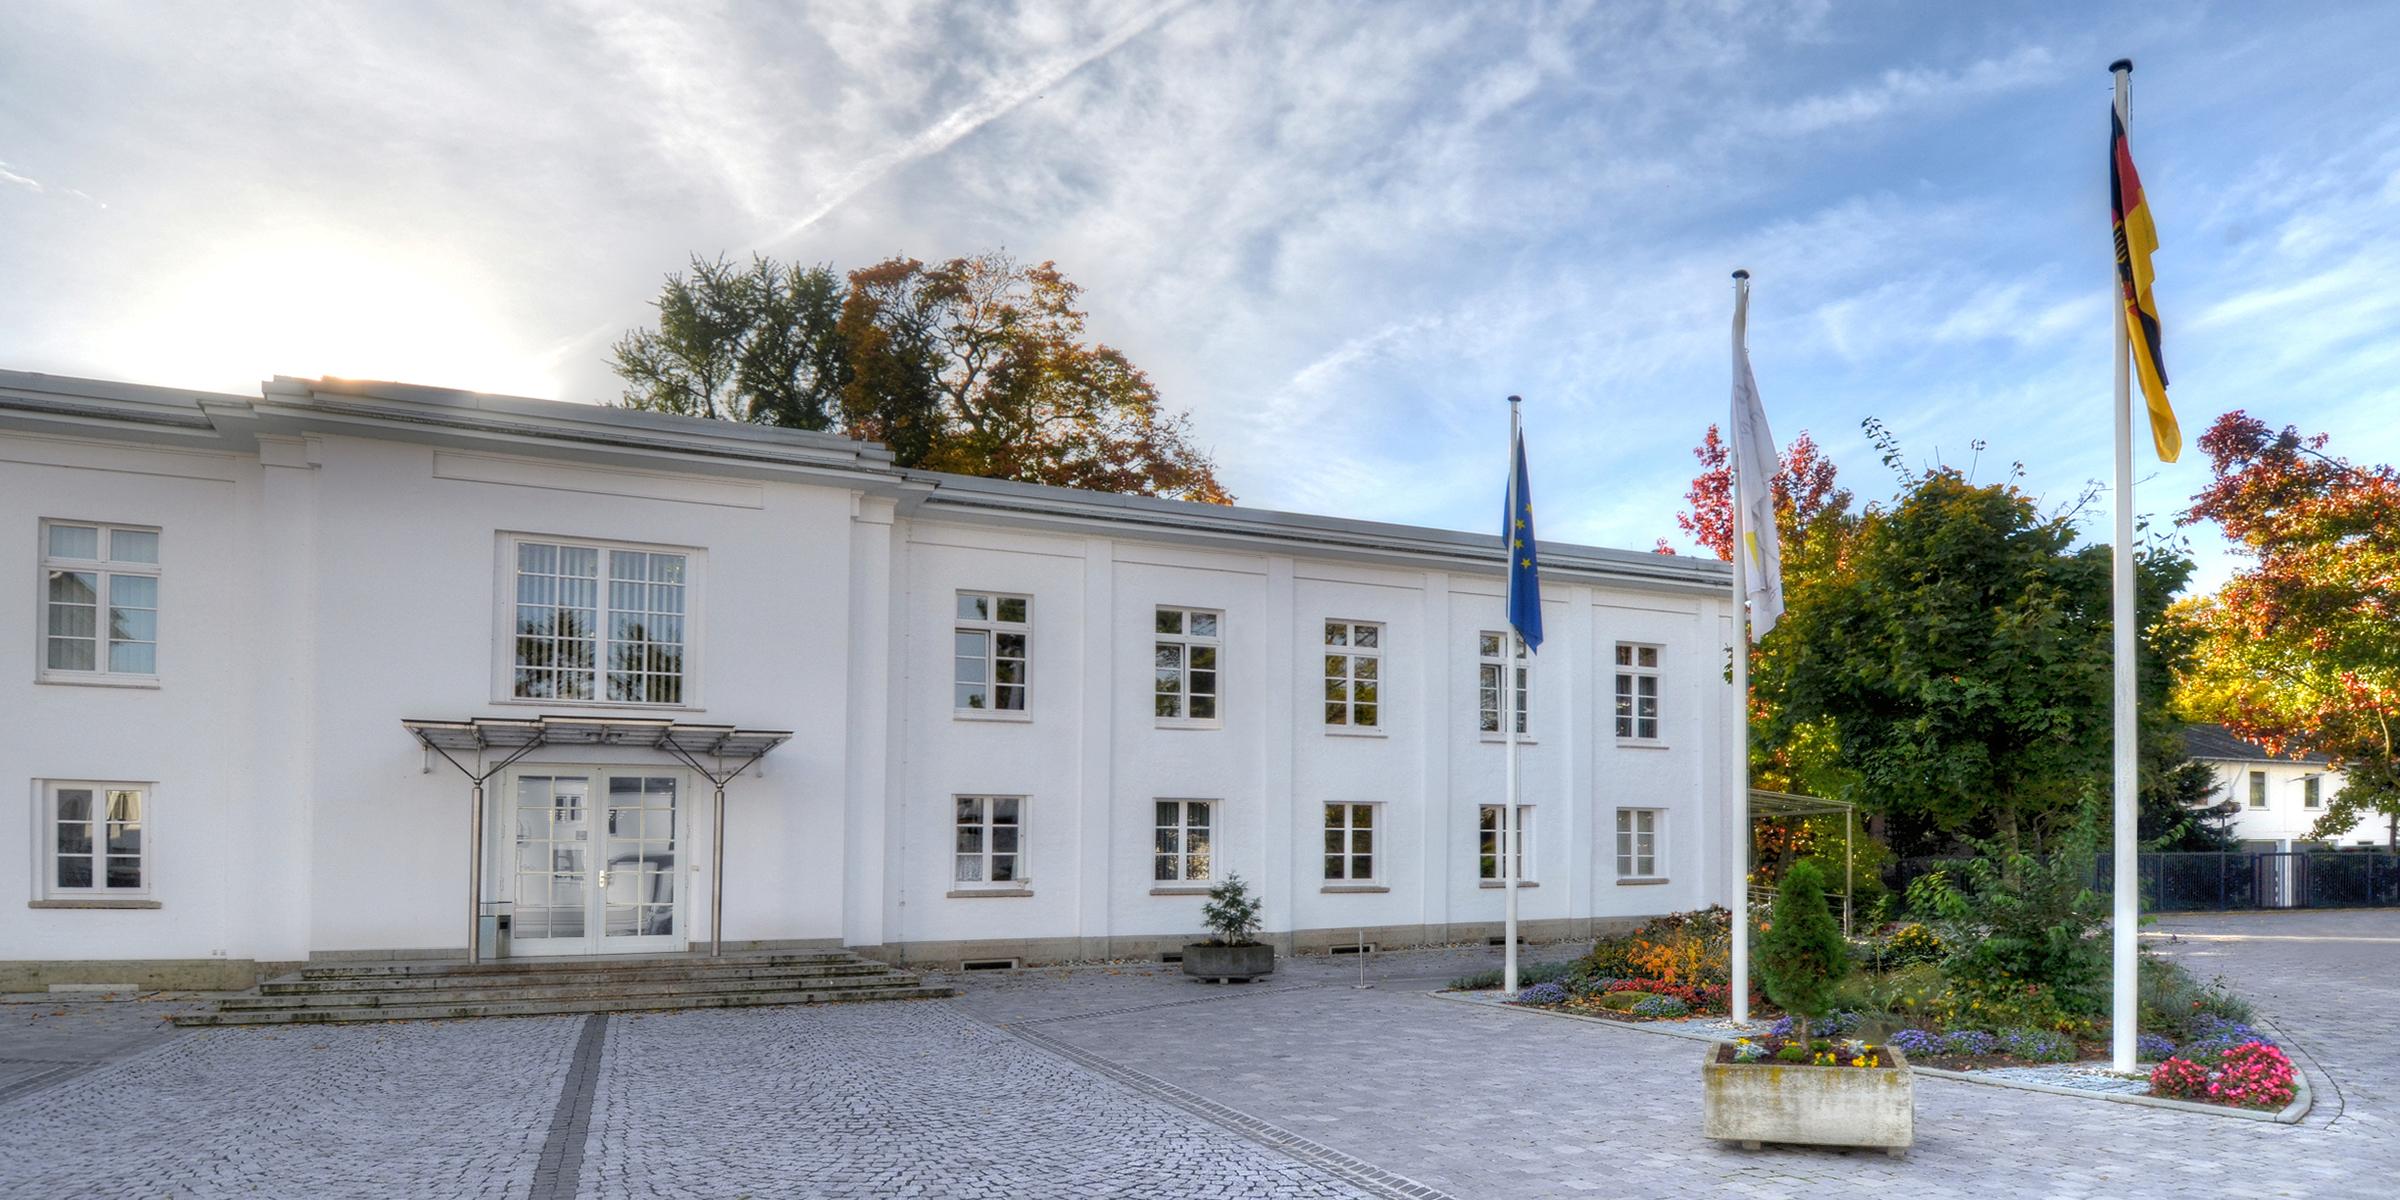 German antitrust proceedings against Apple begin over App Store, ecosystem, and more